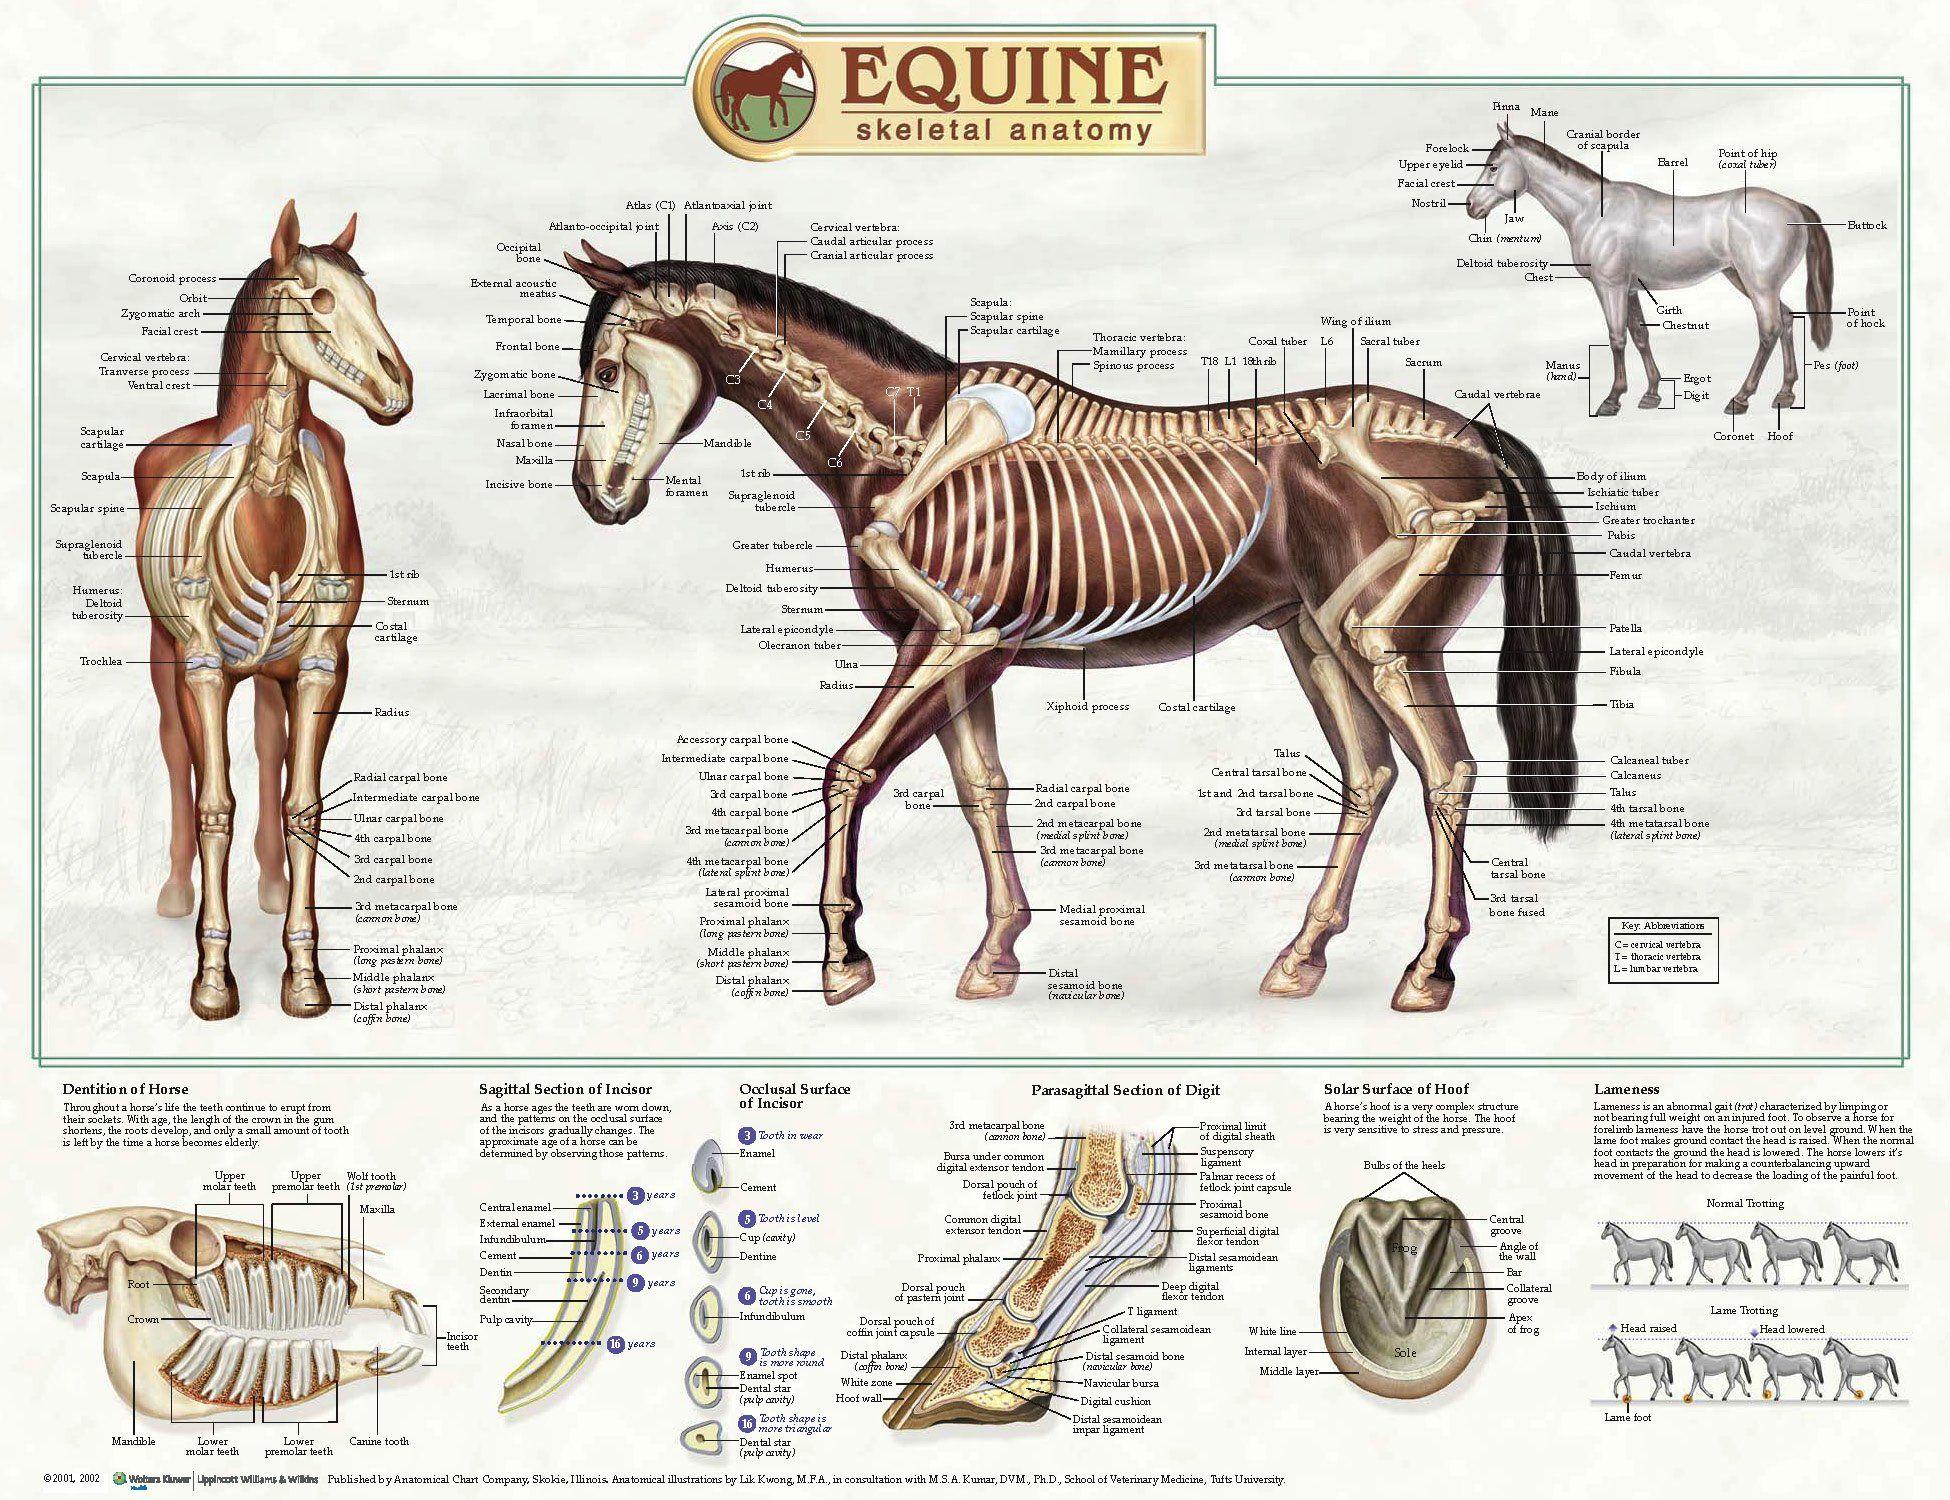 The anatomy coloring book uk - Equine Skeletal Anatomy Laminated Wallchart Poster Amazon Co Uk Lik